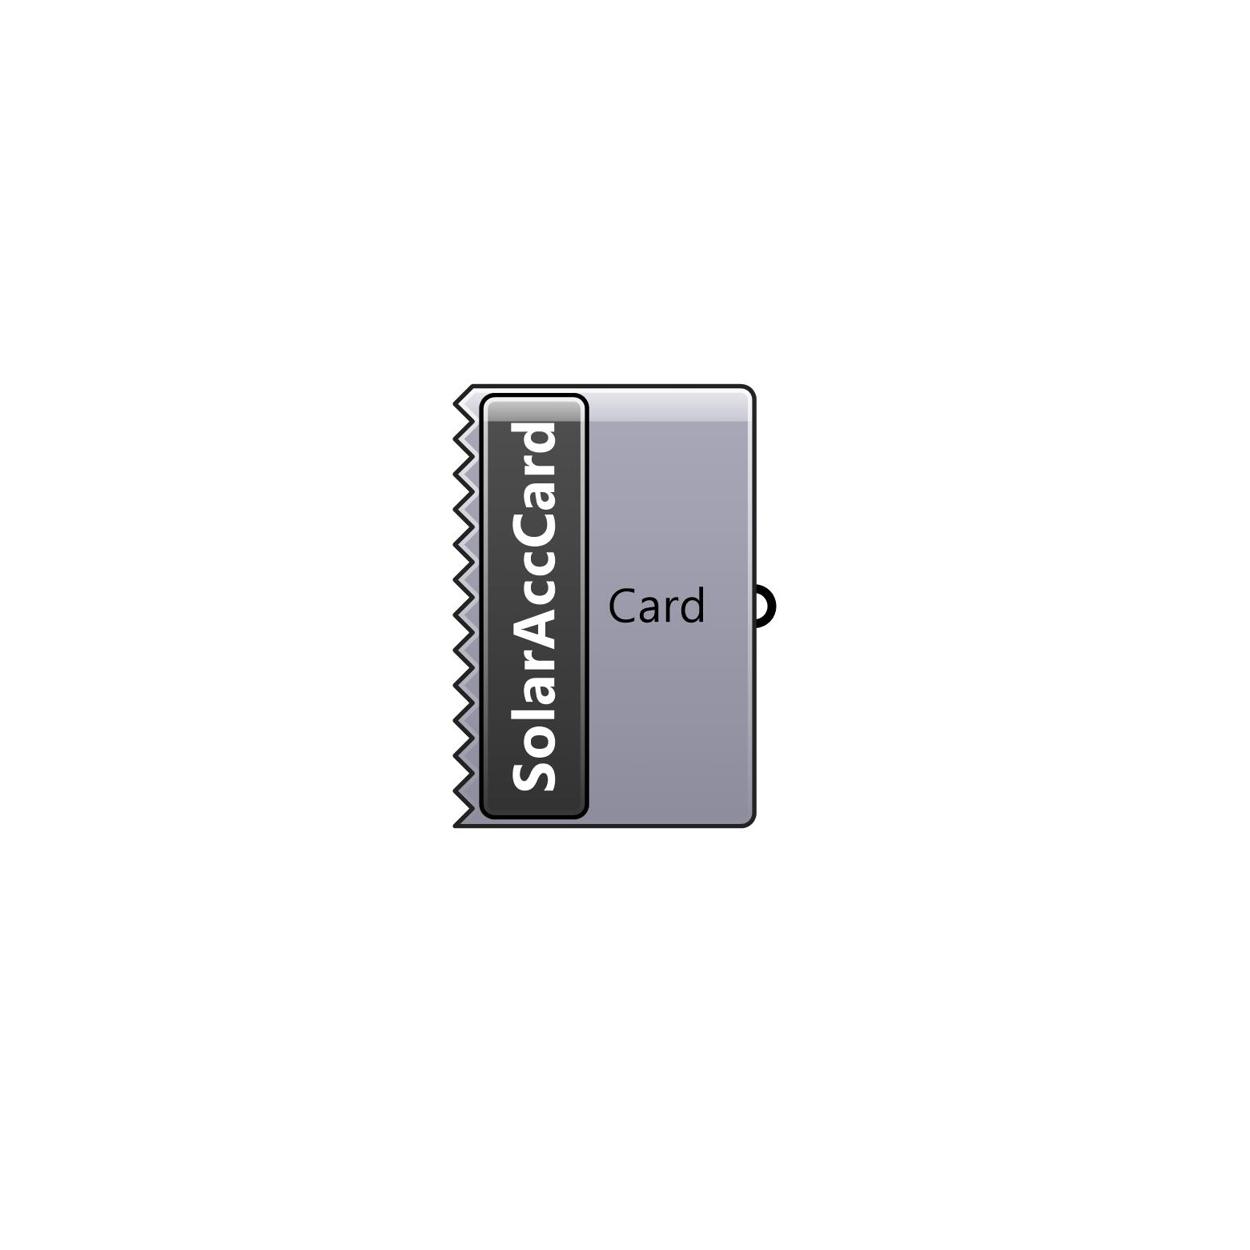 Solar Access Card component